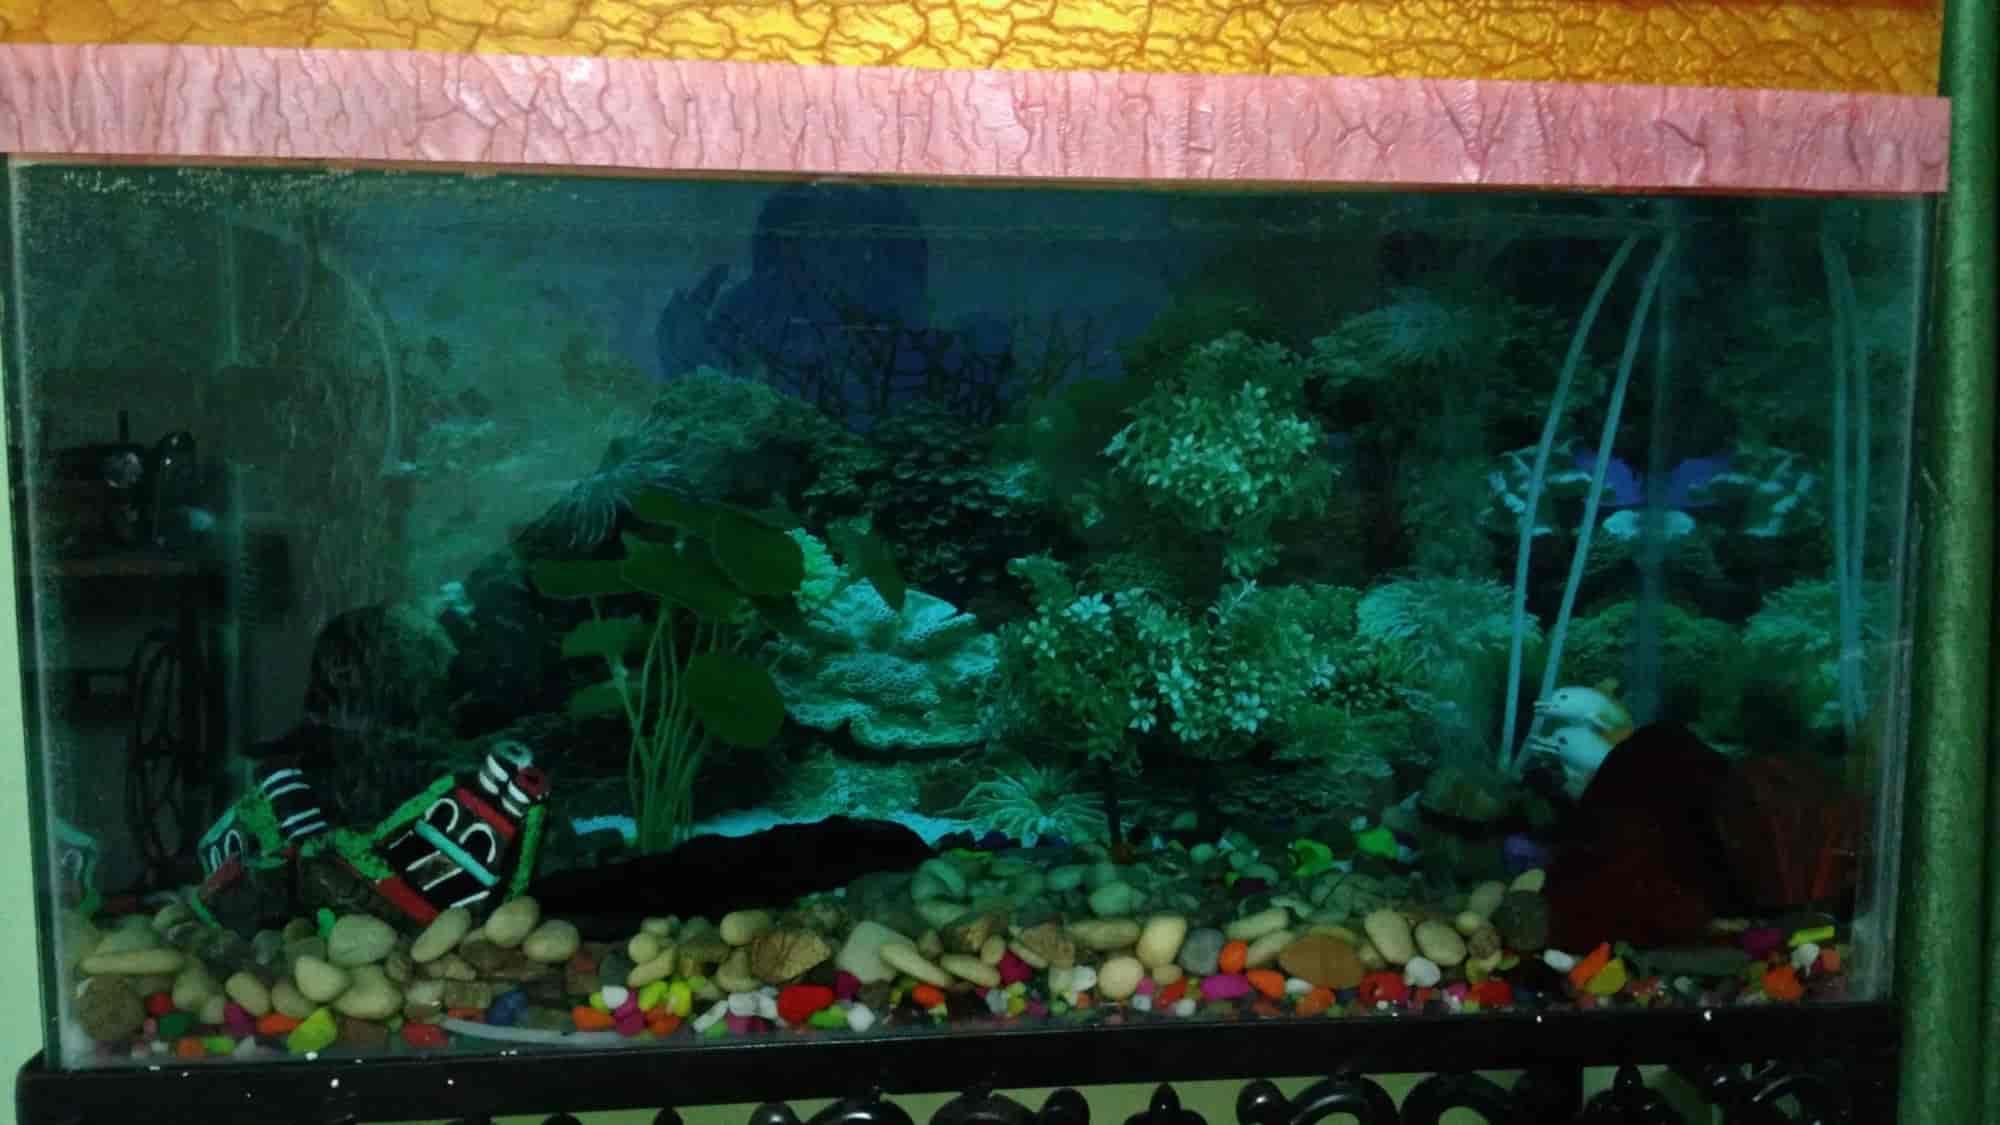 JANETTE: Jalpari Fish